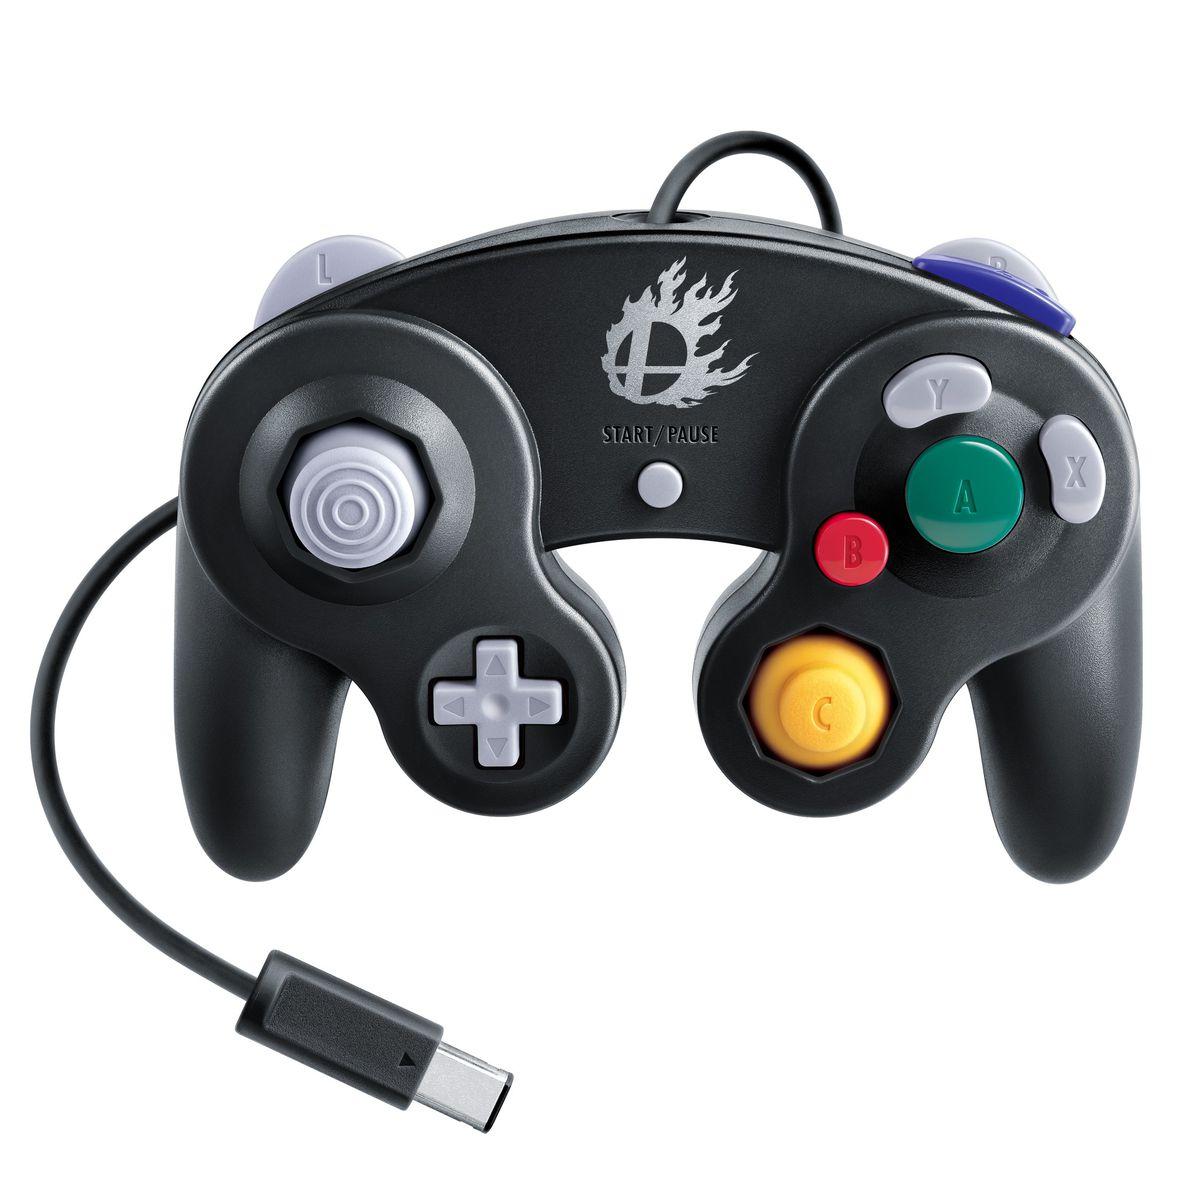 Gamecube Controller Smash Bros Edition (Wii U) ...